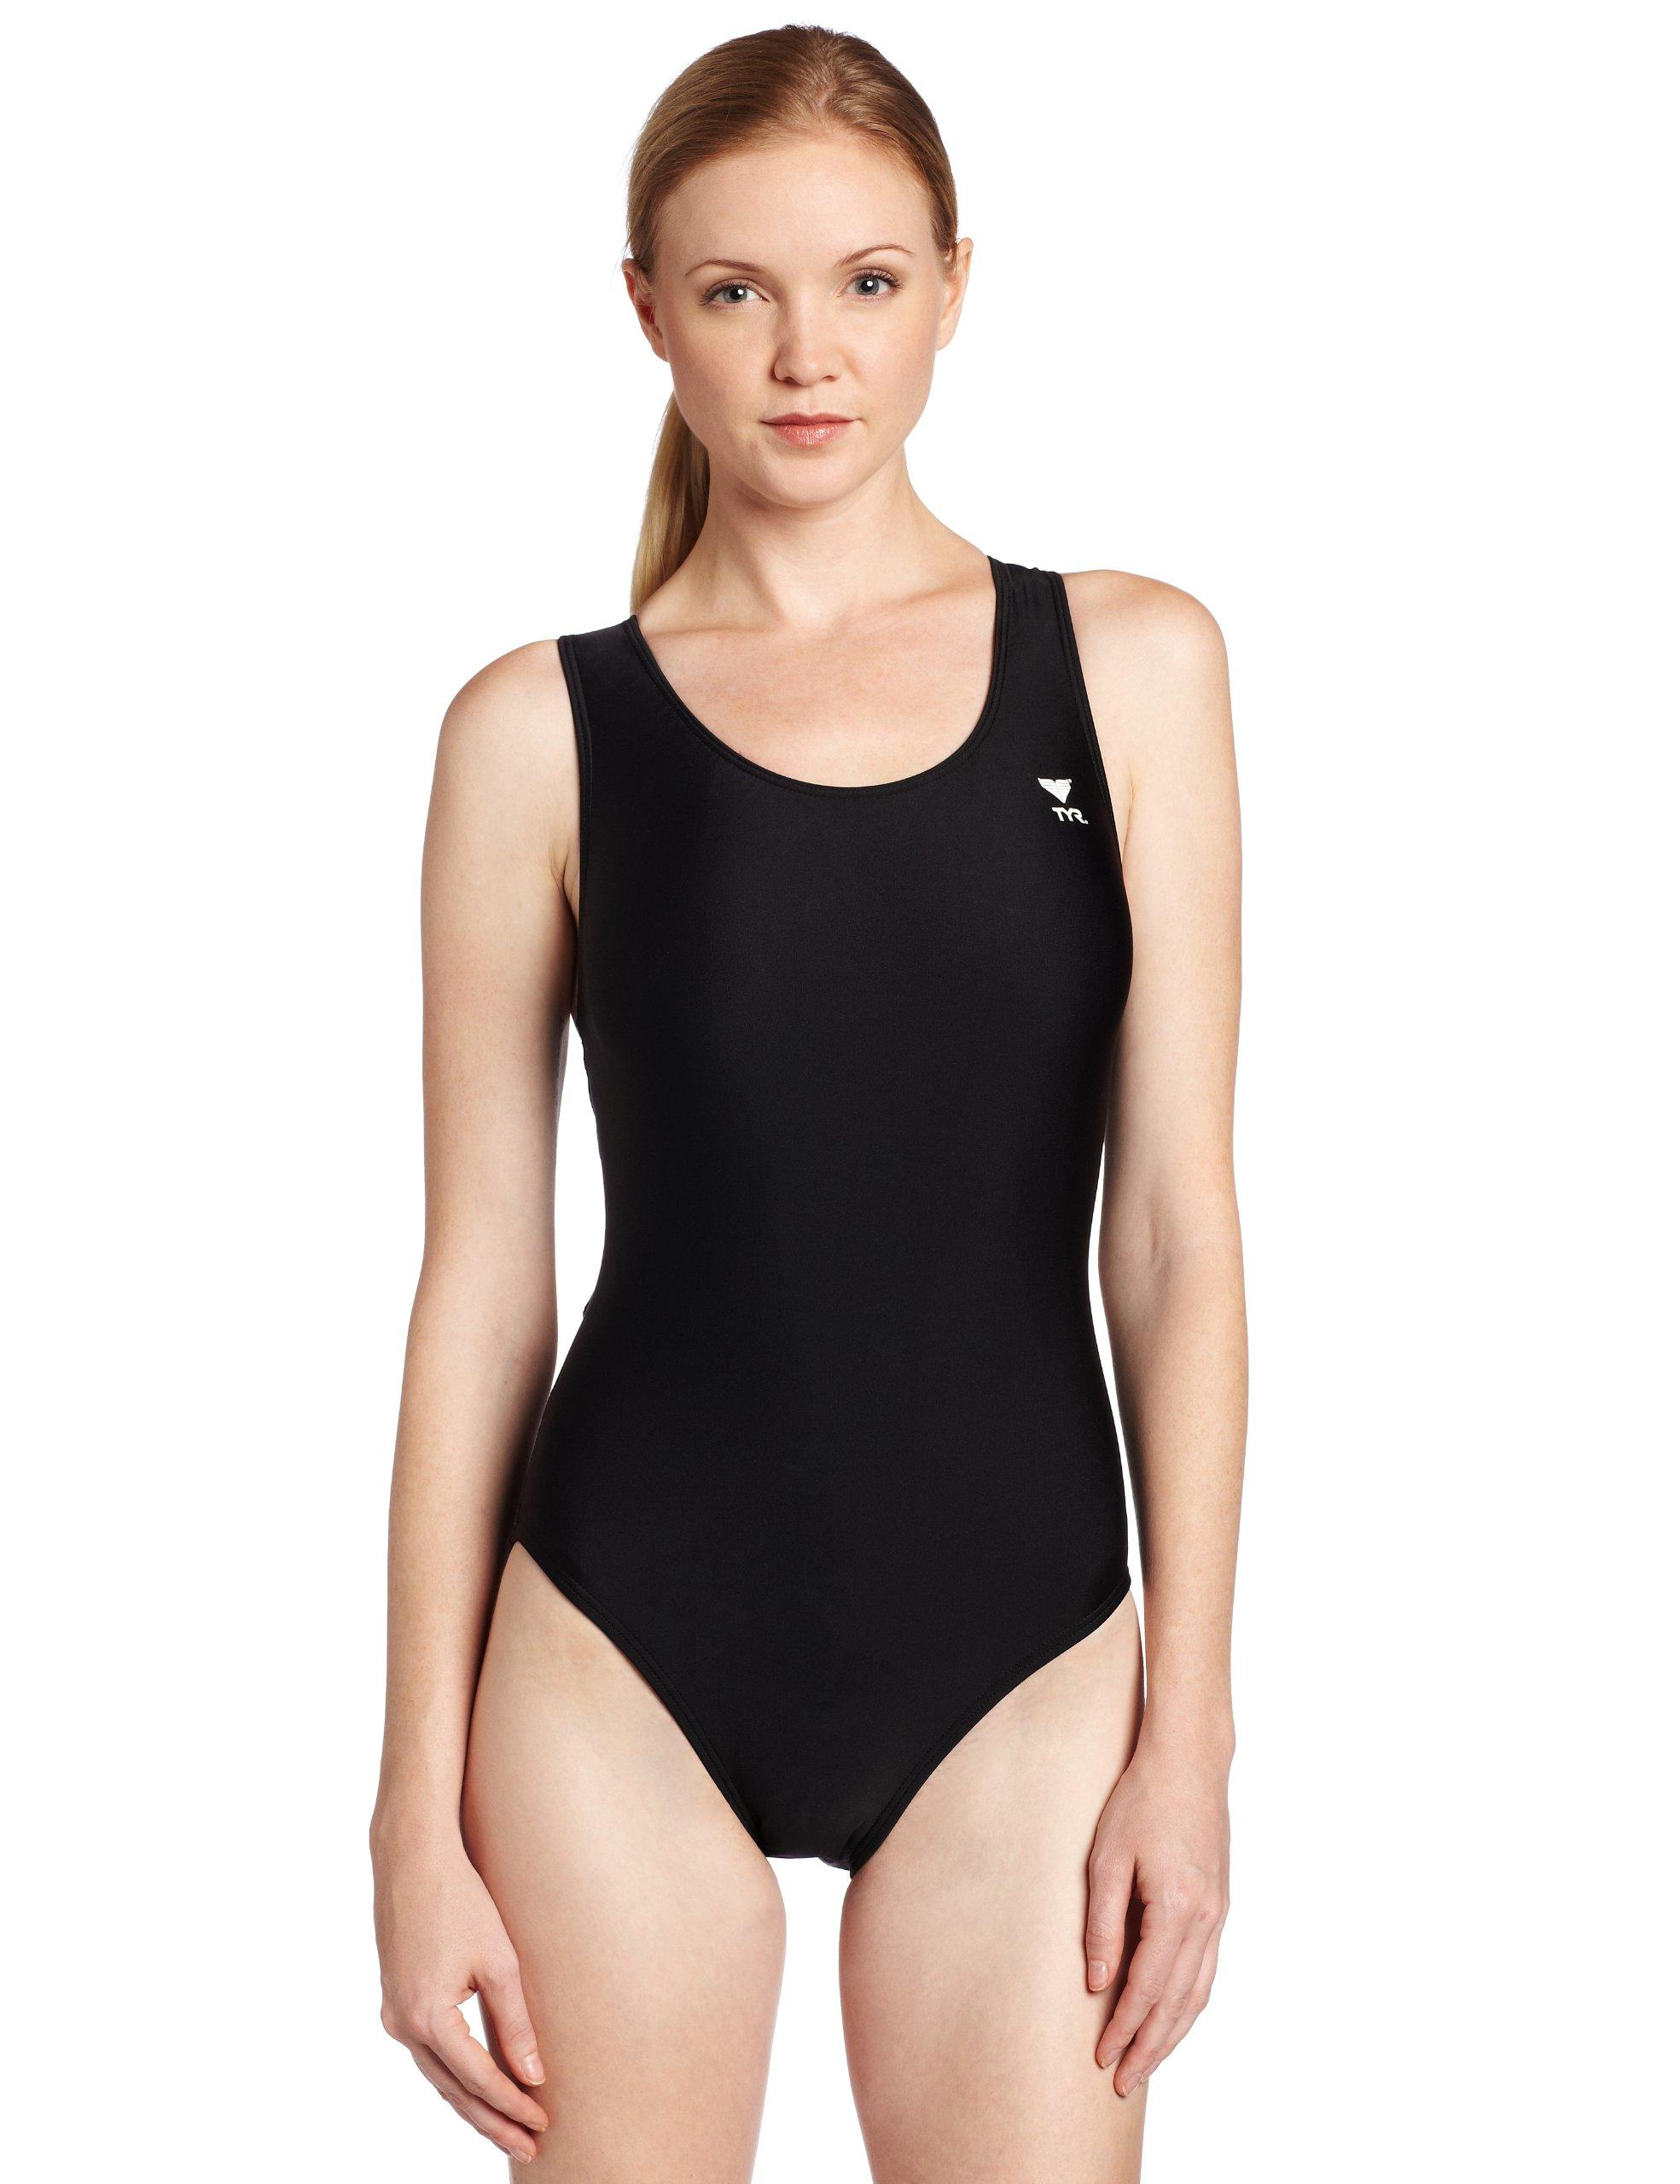 TYR Sport Women's Solid Maxback Swim Suit (Black, 34)